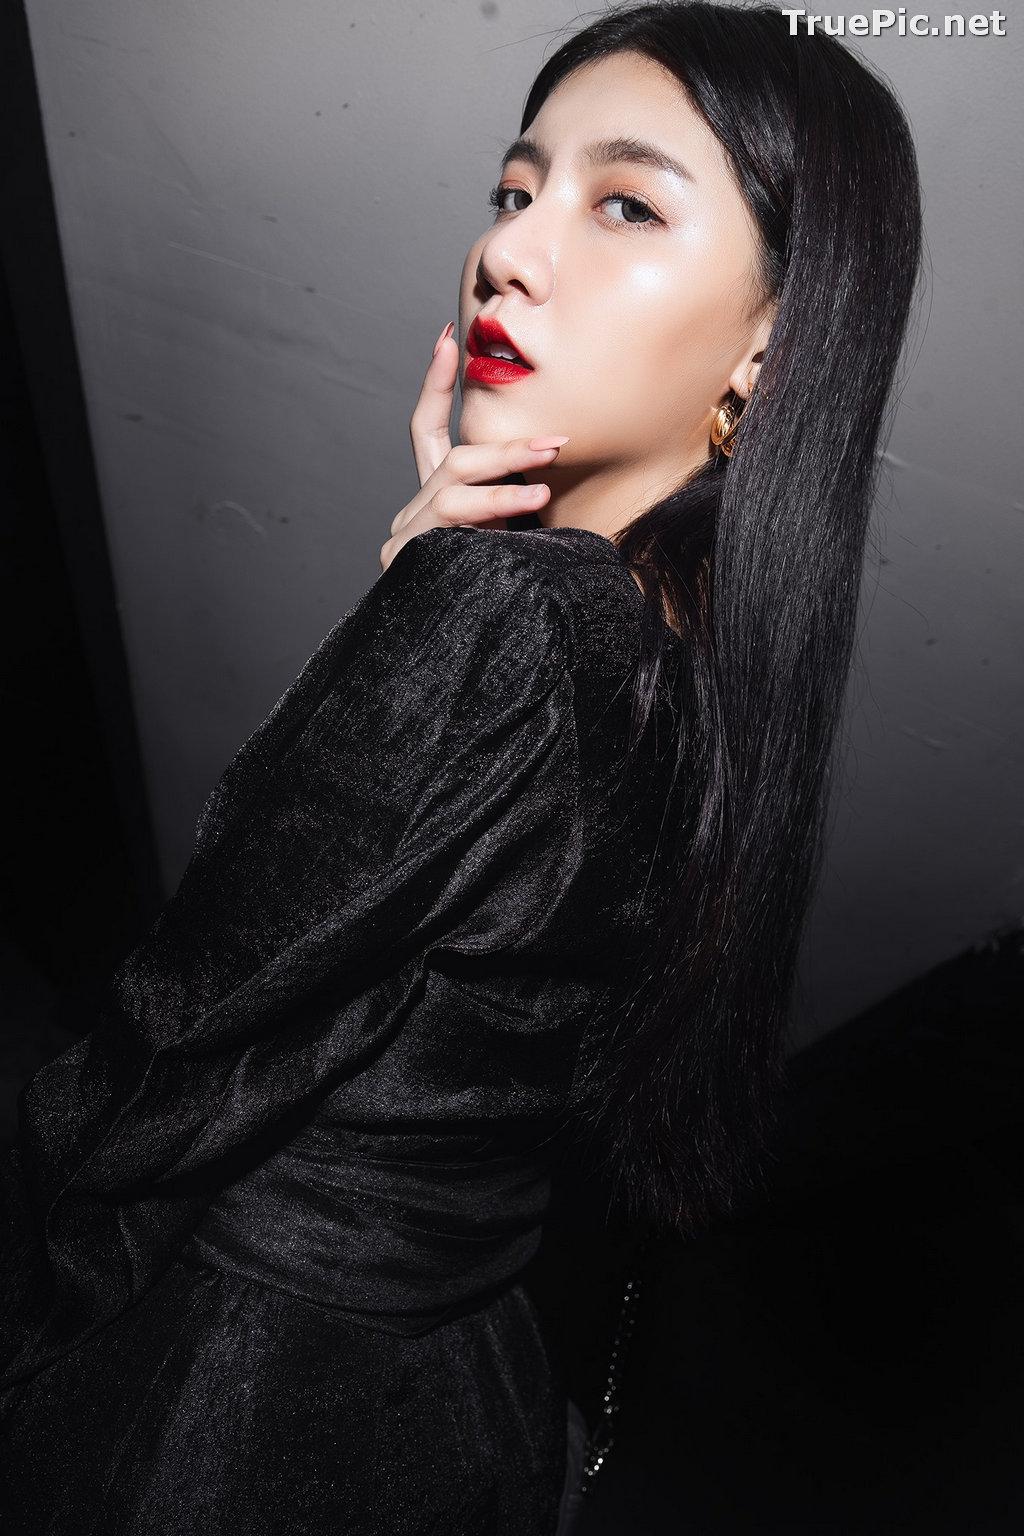 Image Thailand Model - Sasi Ngiunwan - Black For SiamNight - TruePic.net - Picture-11